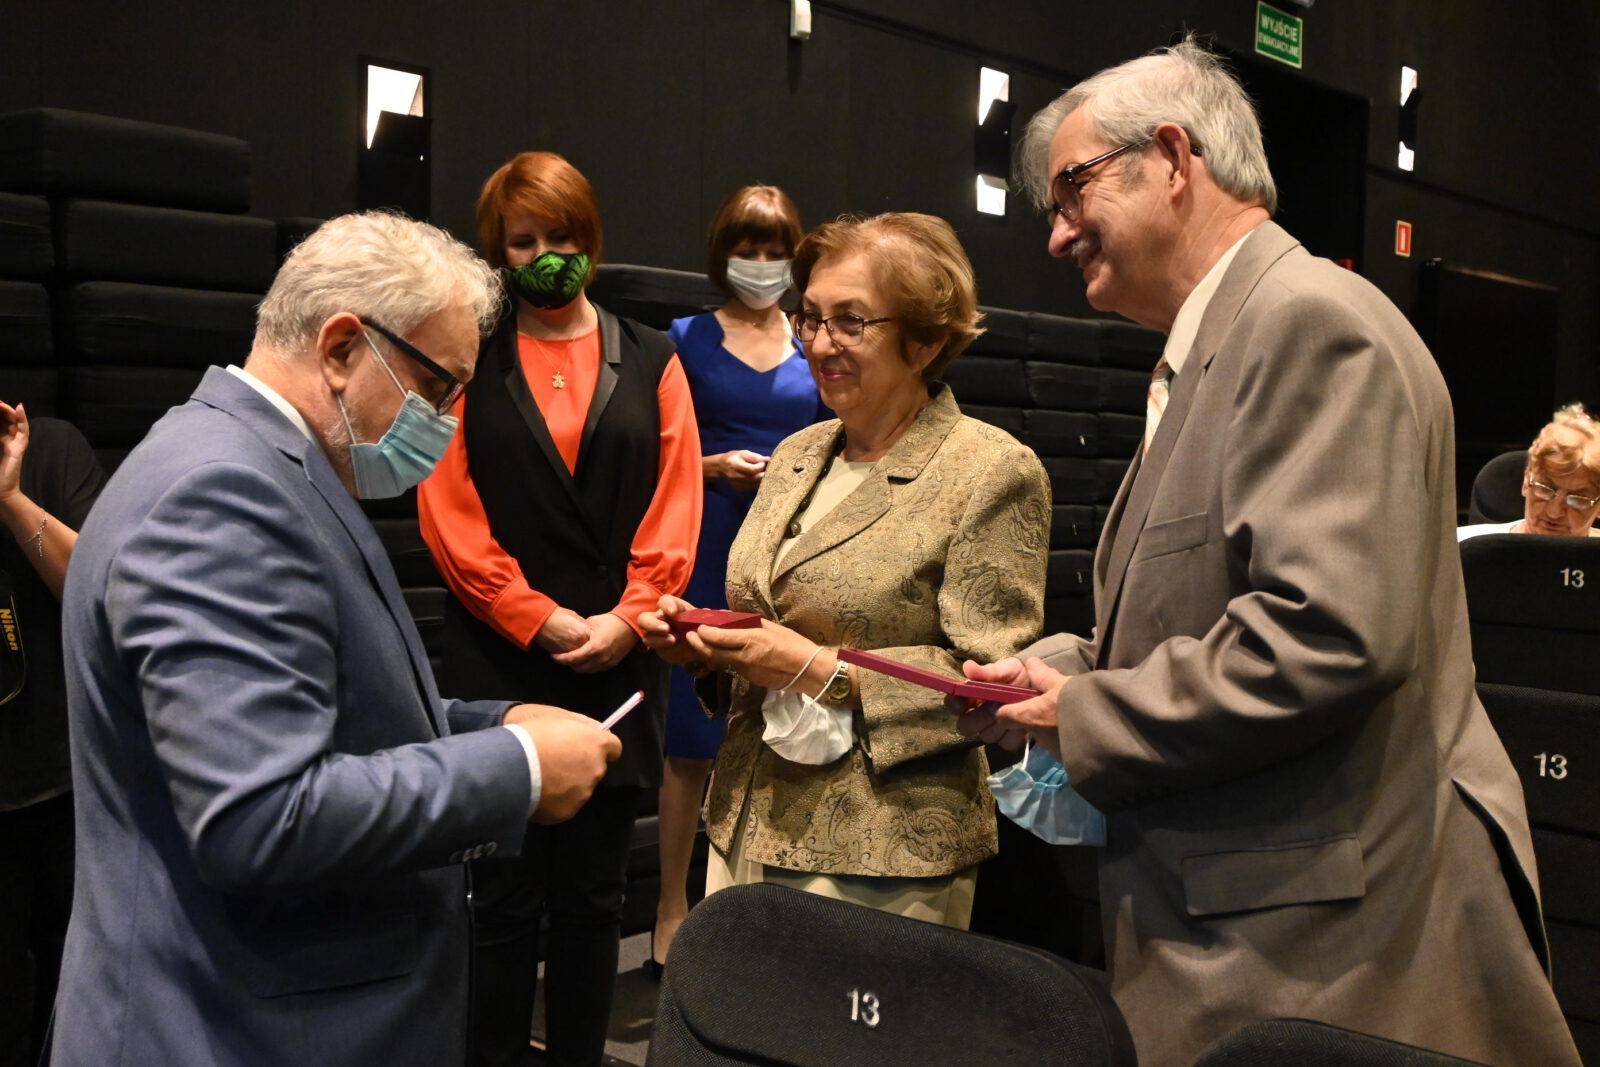 Burmistrz Arkadiusz Czech wręcza medal Jubilatom